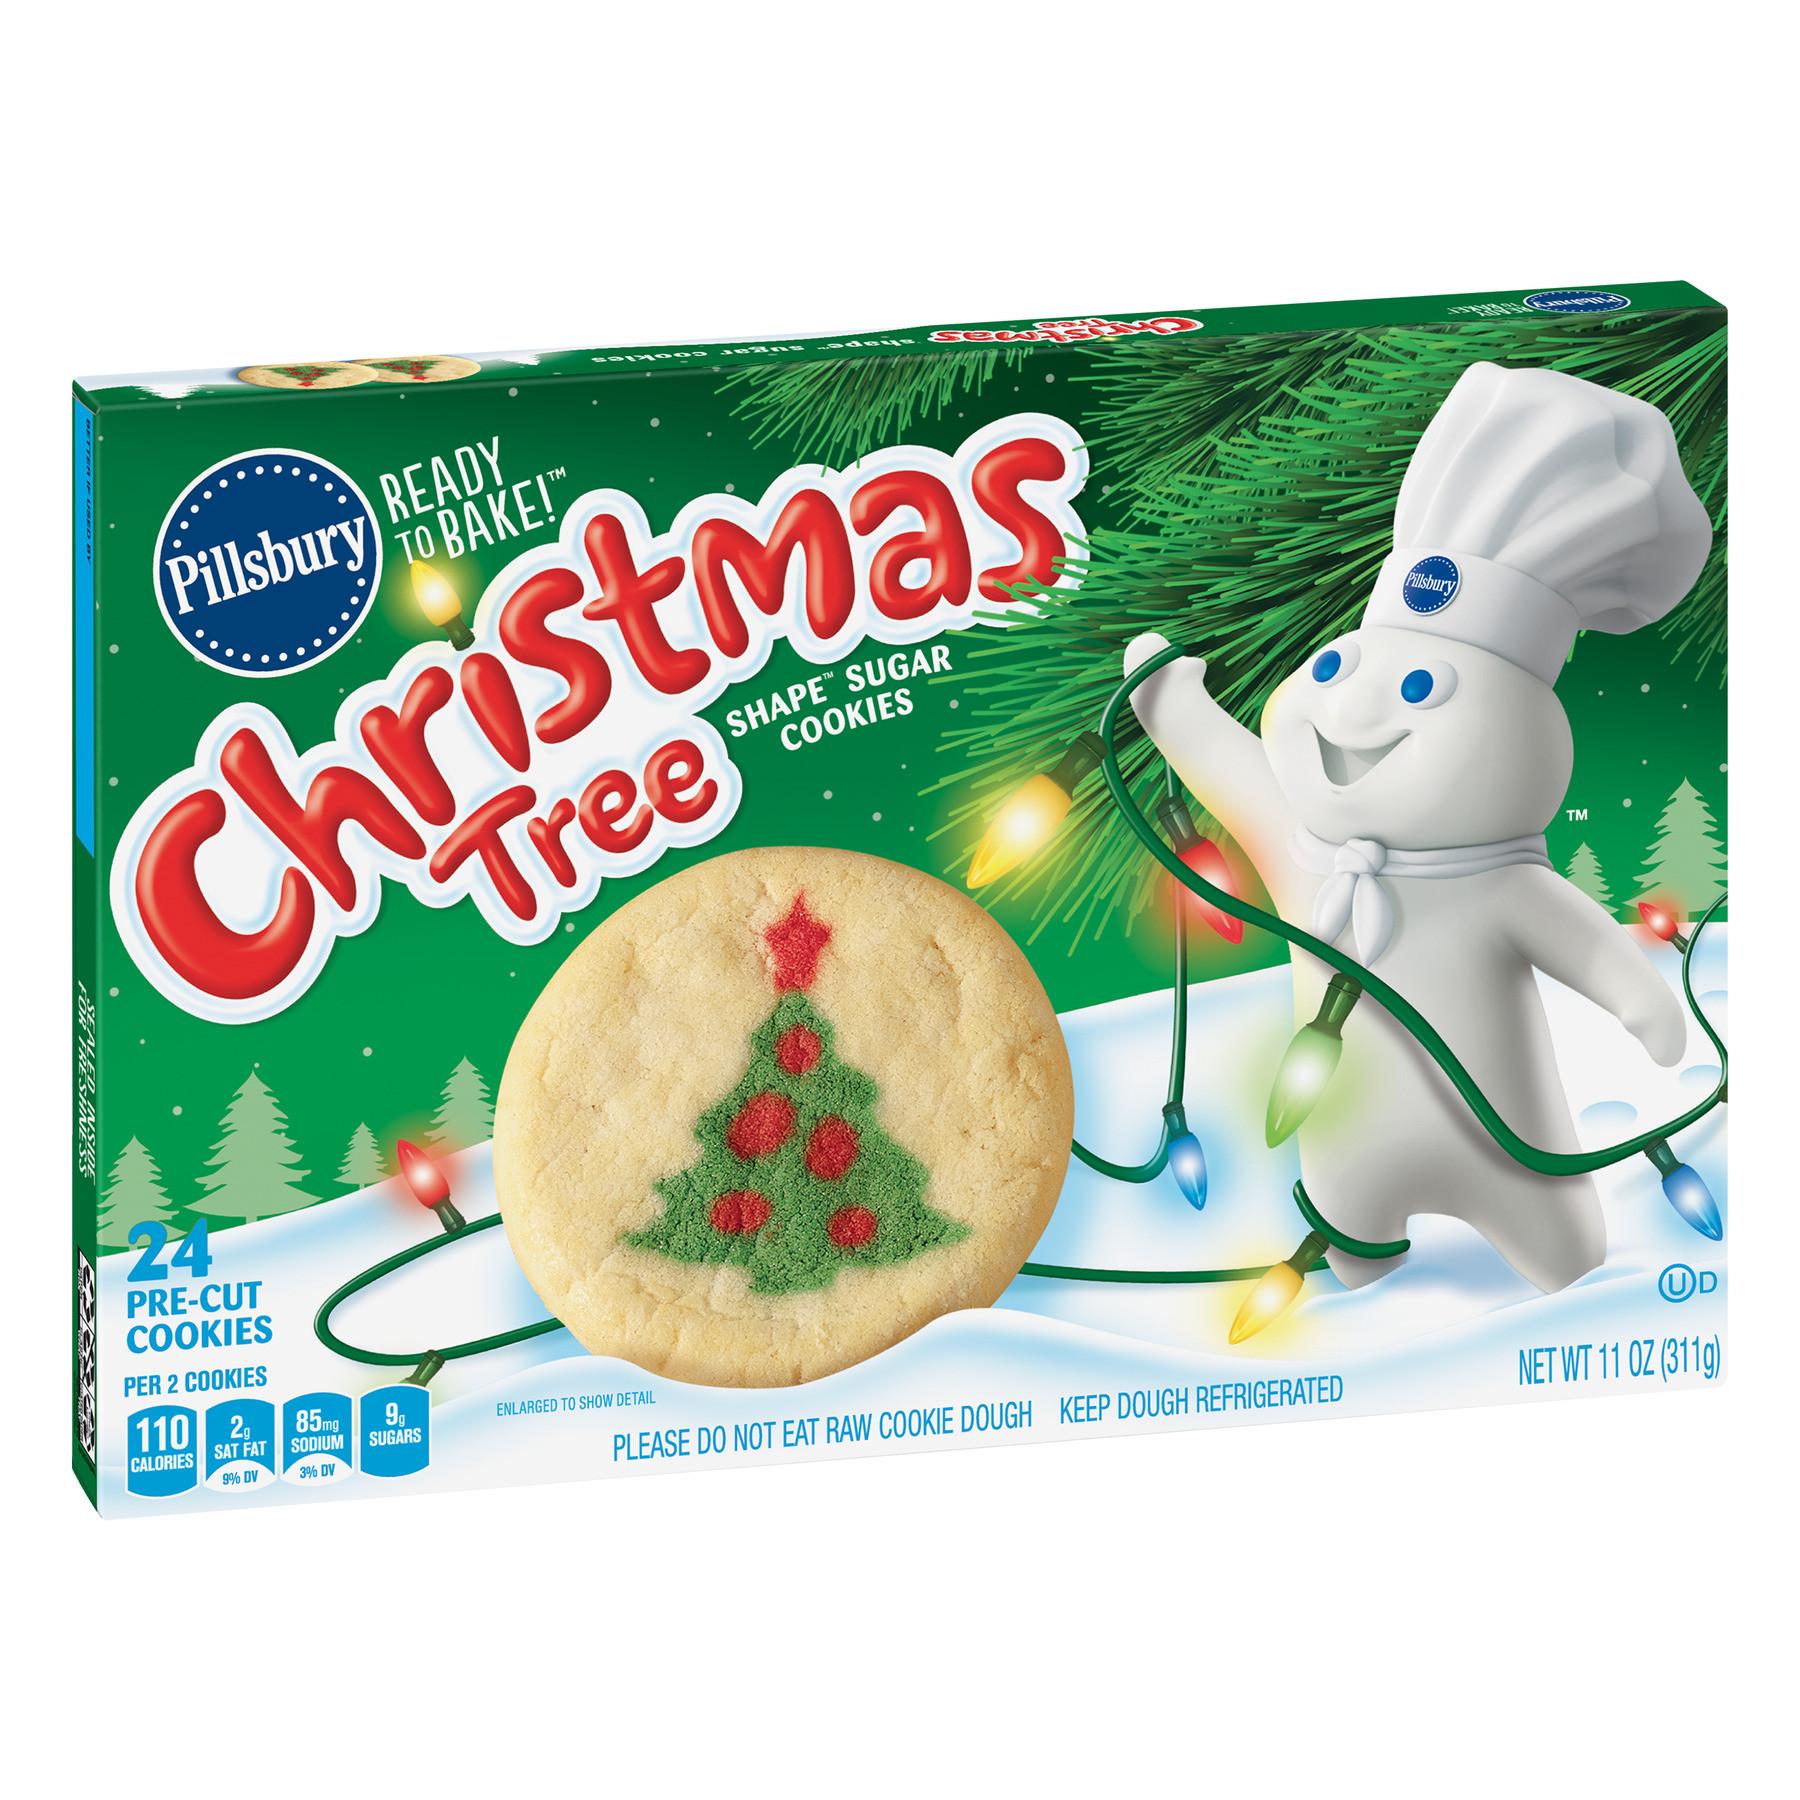 Pillsbury Christmas Sugar Cookies  Pillsbury Ready to Bake Christmas Tree Shape Sugar